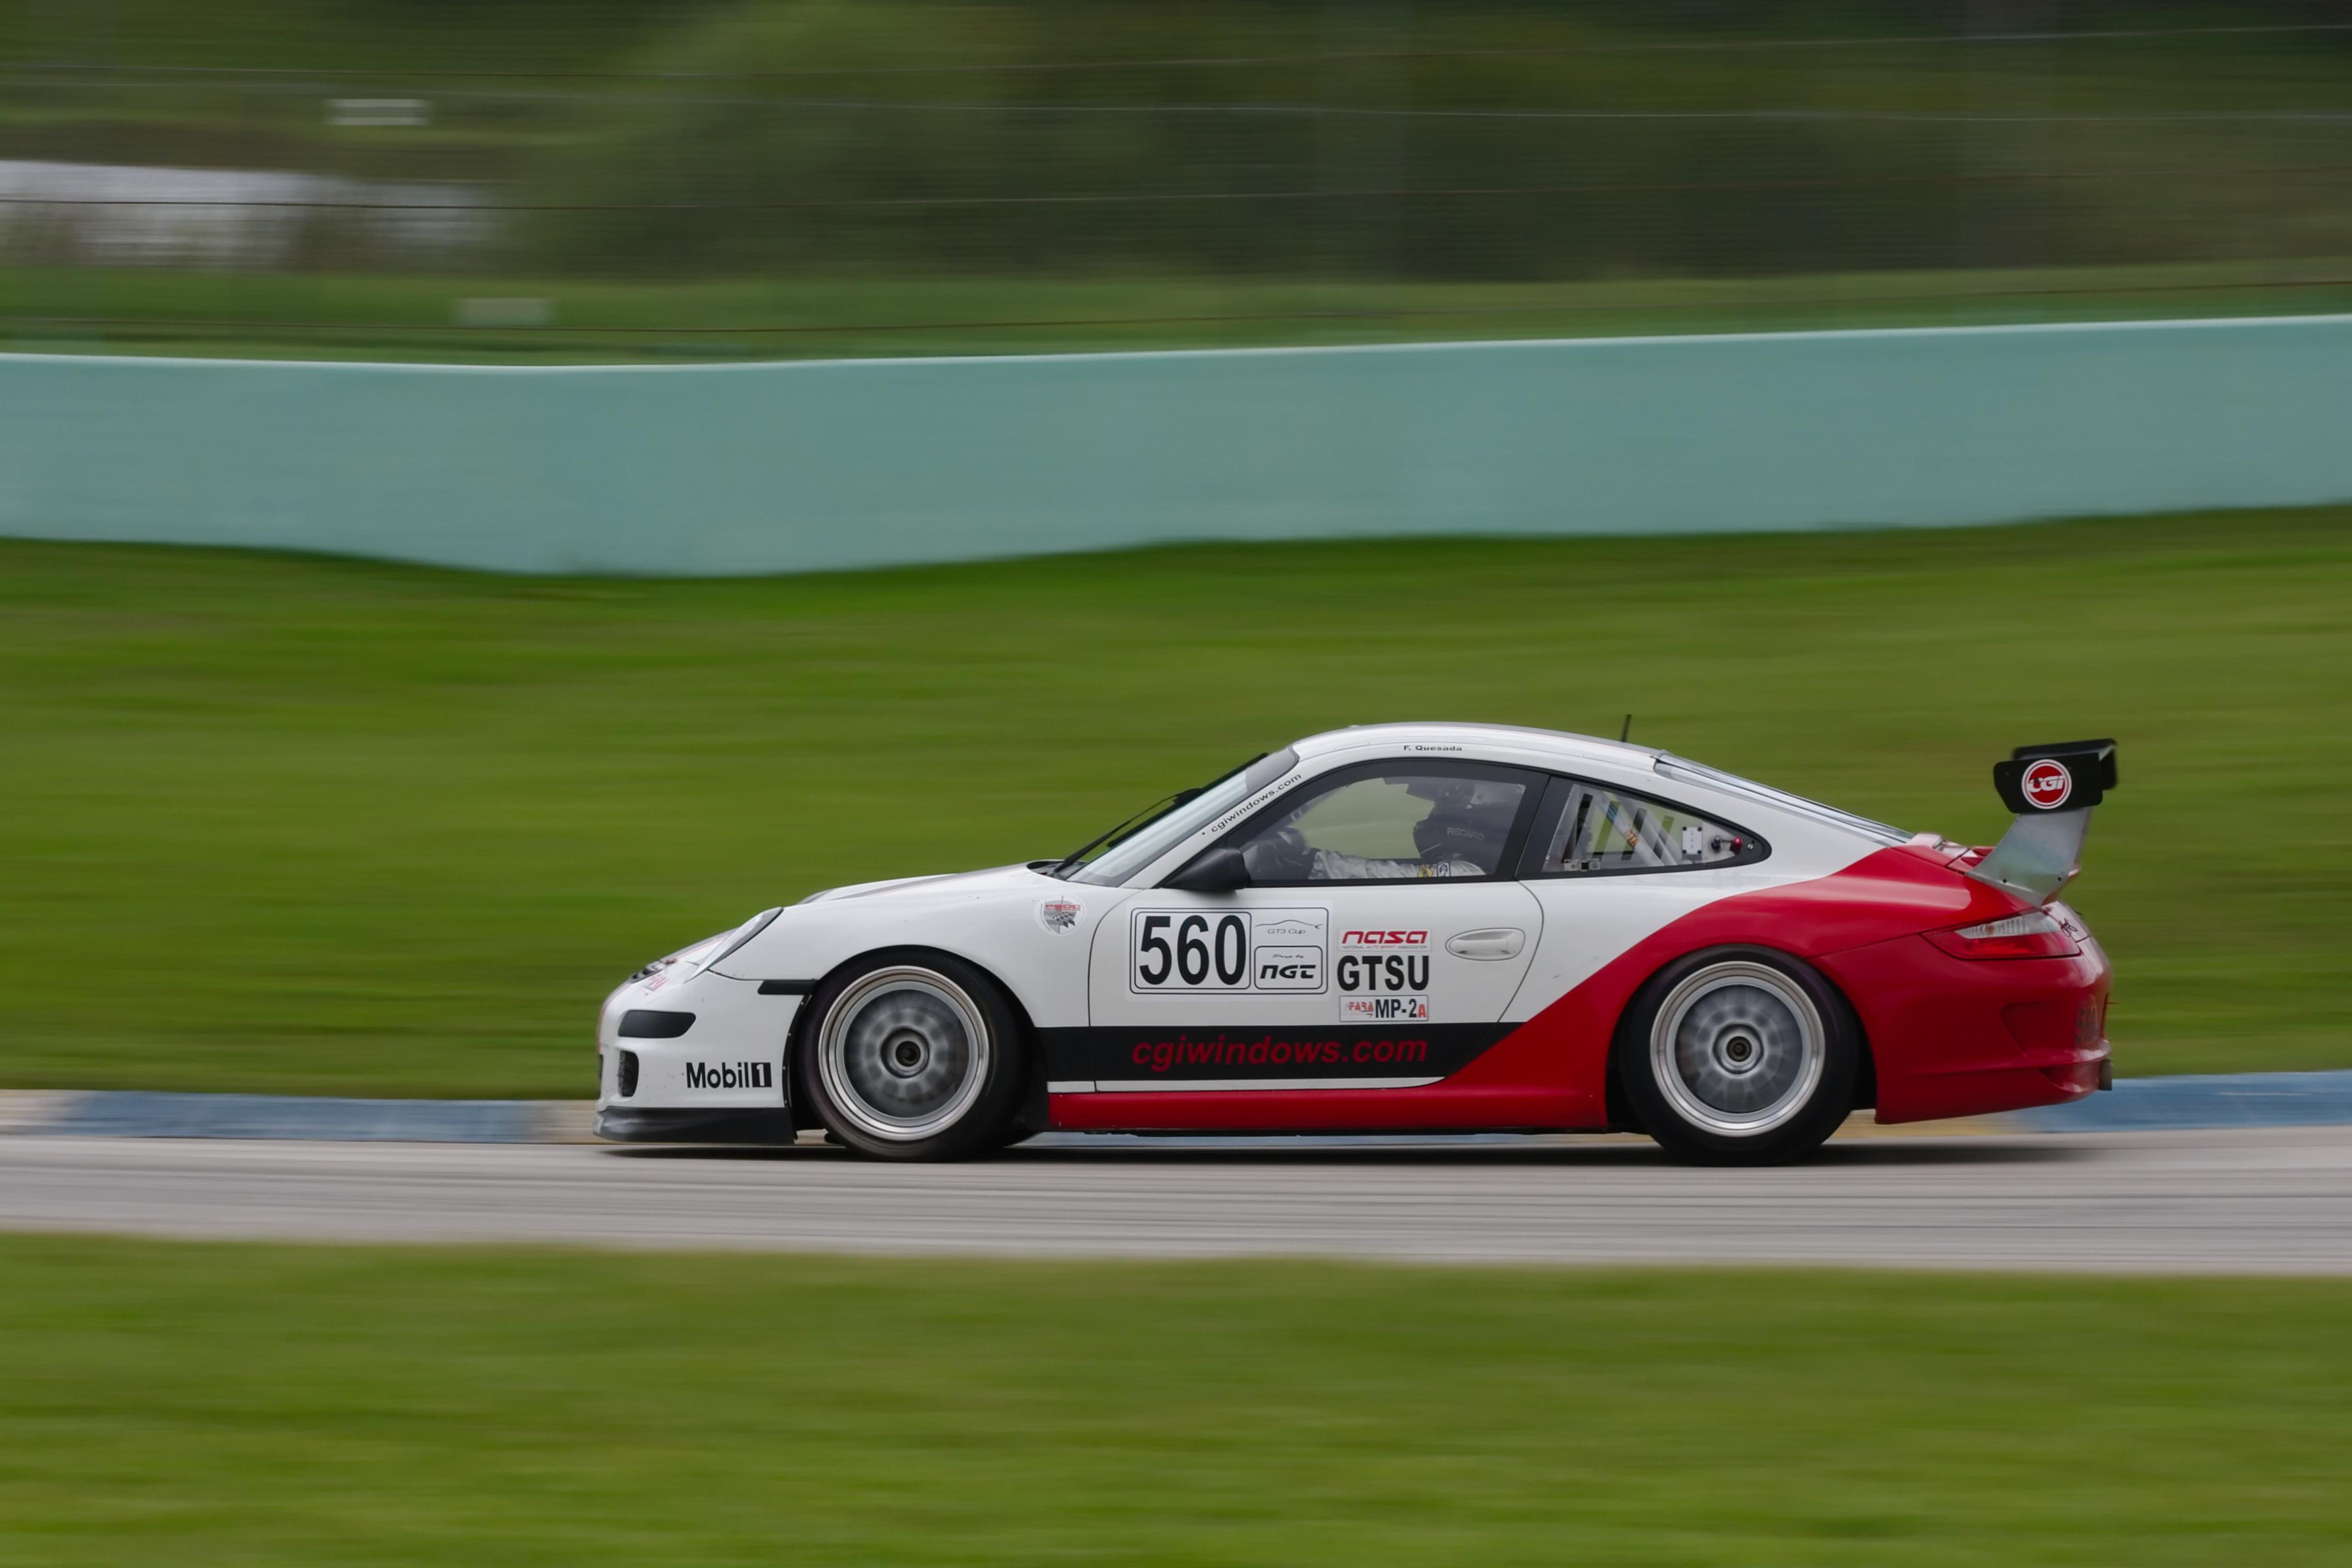 Florida Race Track Cars